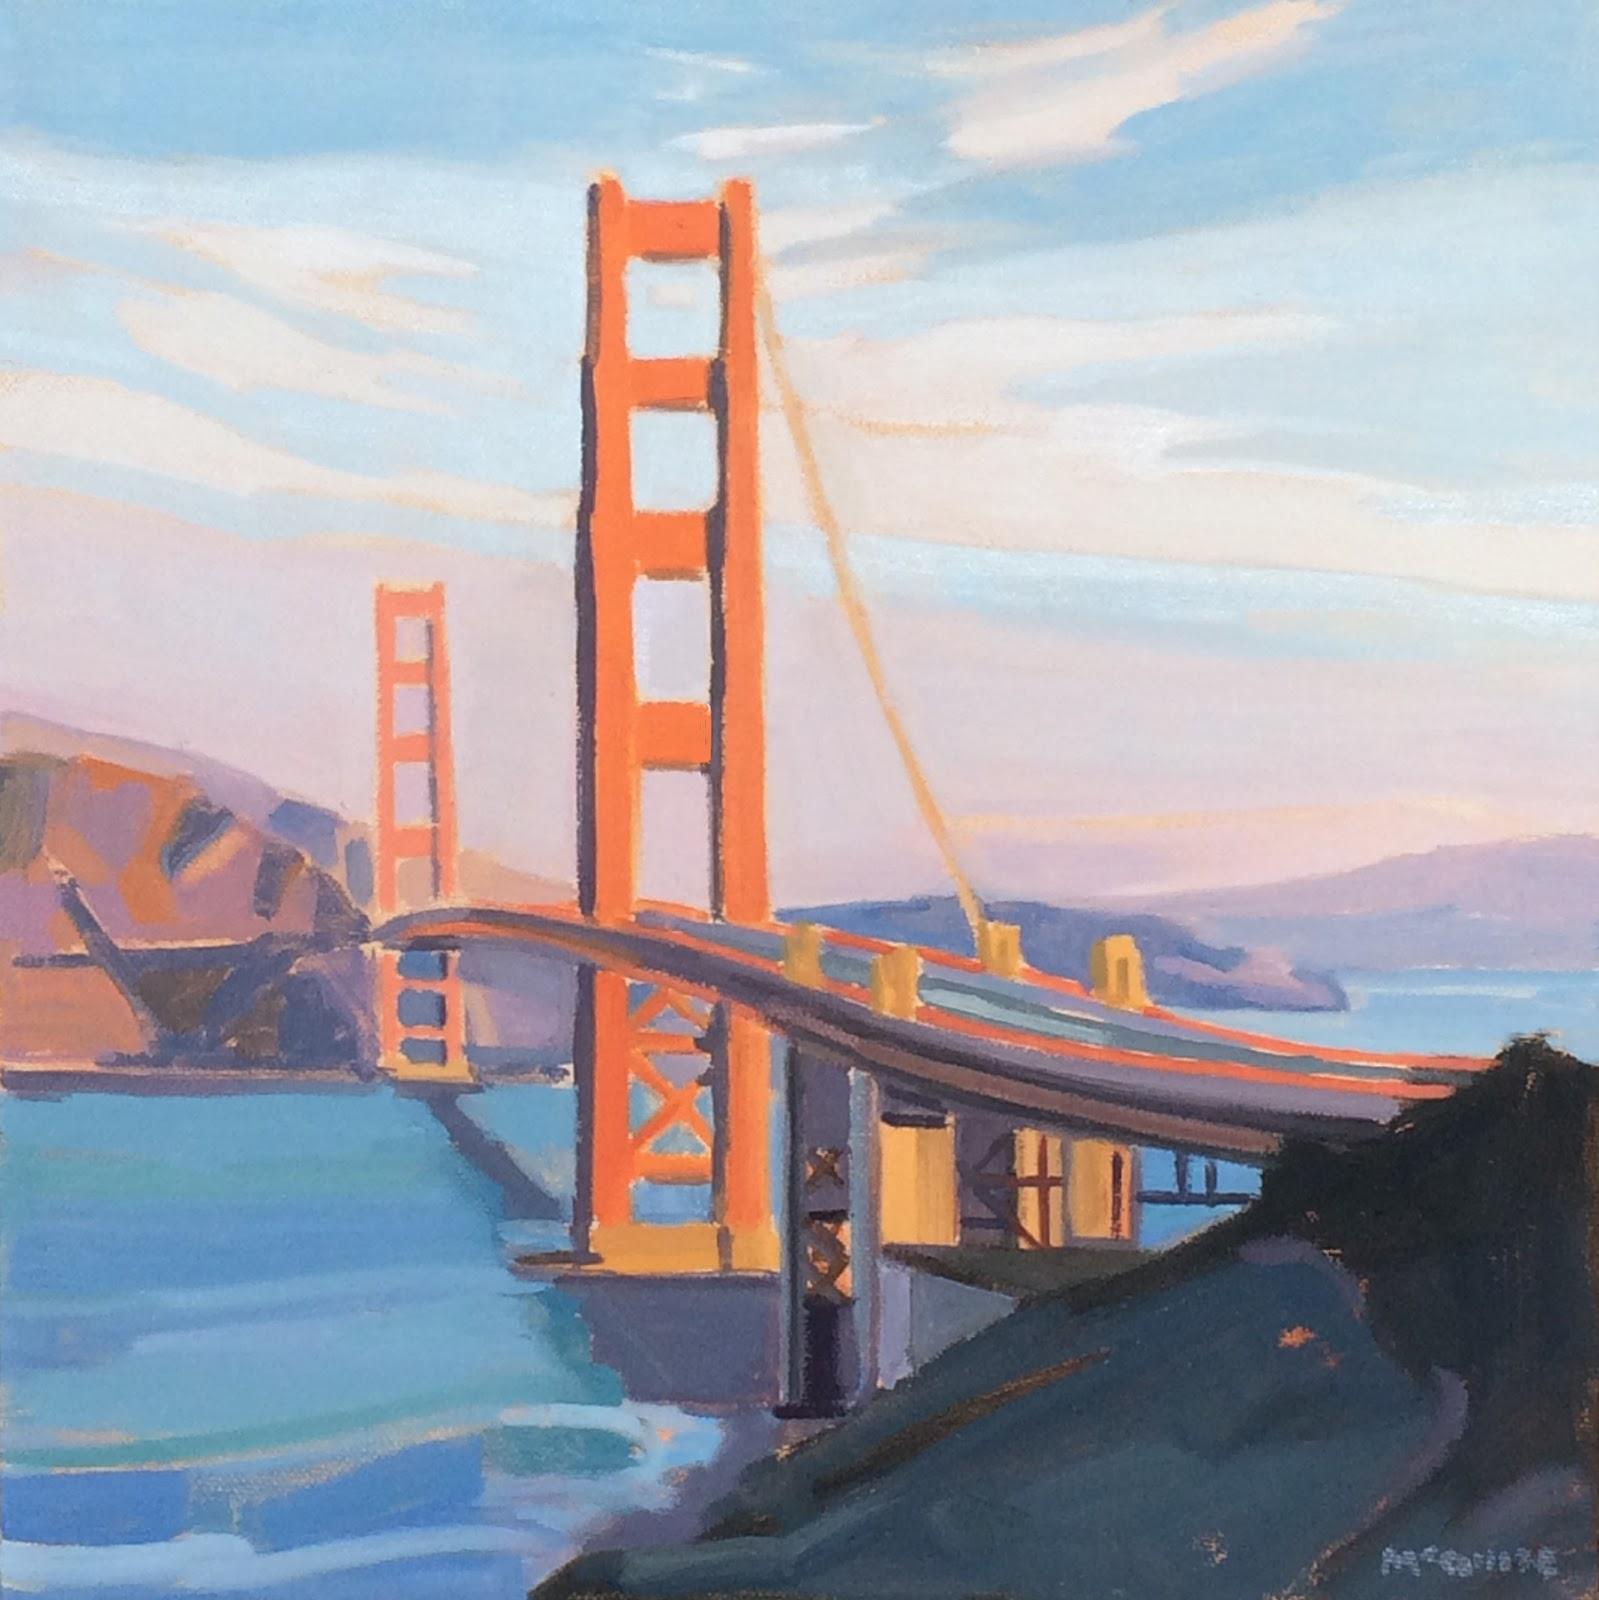 Golden Gate Bridge San Francisco California Sunset Picture: Katherine McGuire Artist, Oil Paintings Of California